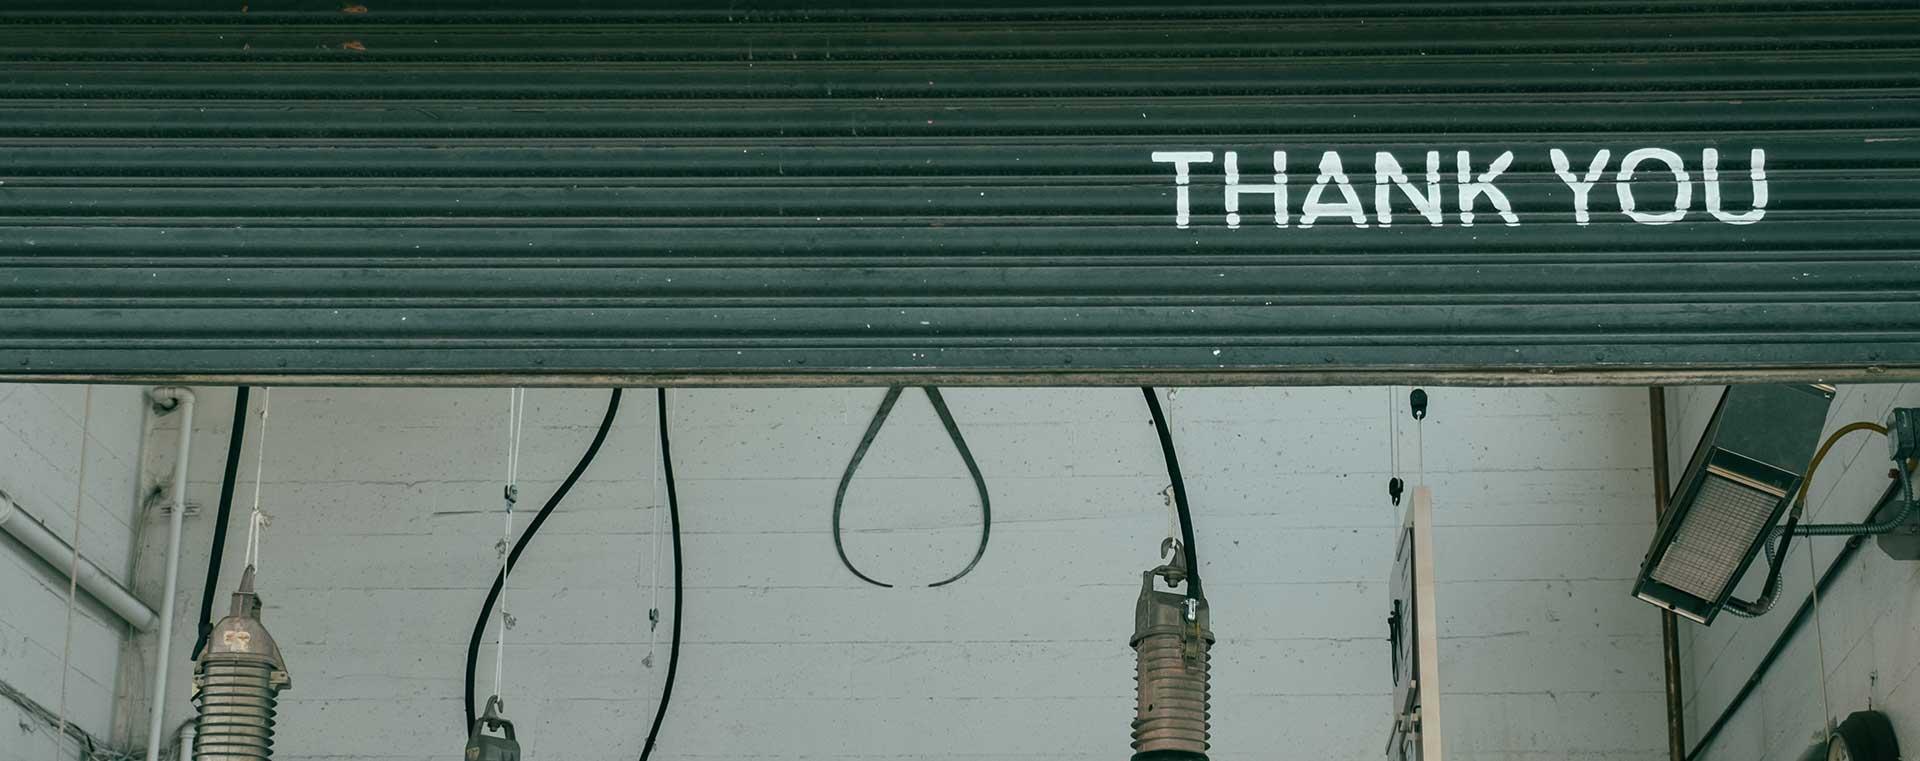 green-shutters-lights-thank-you-writing